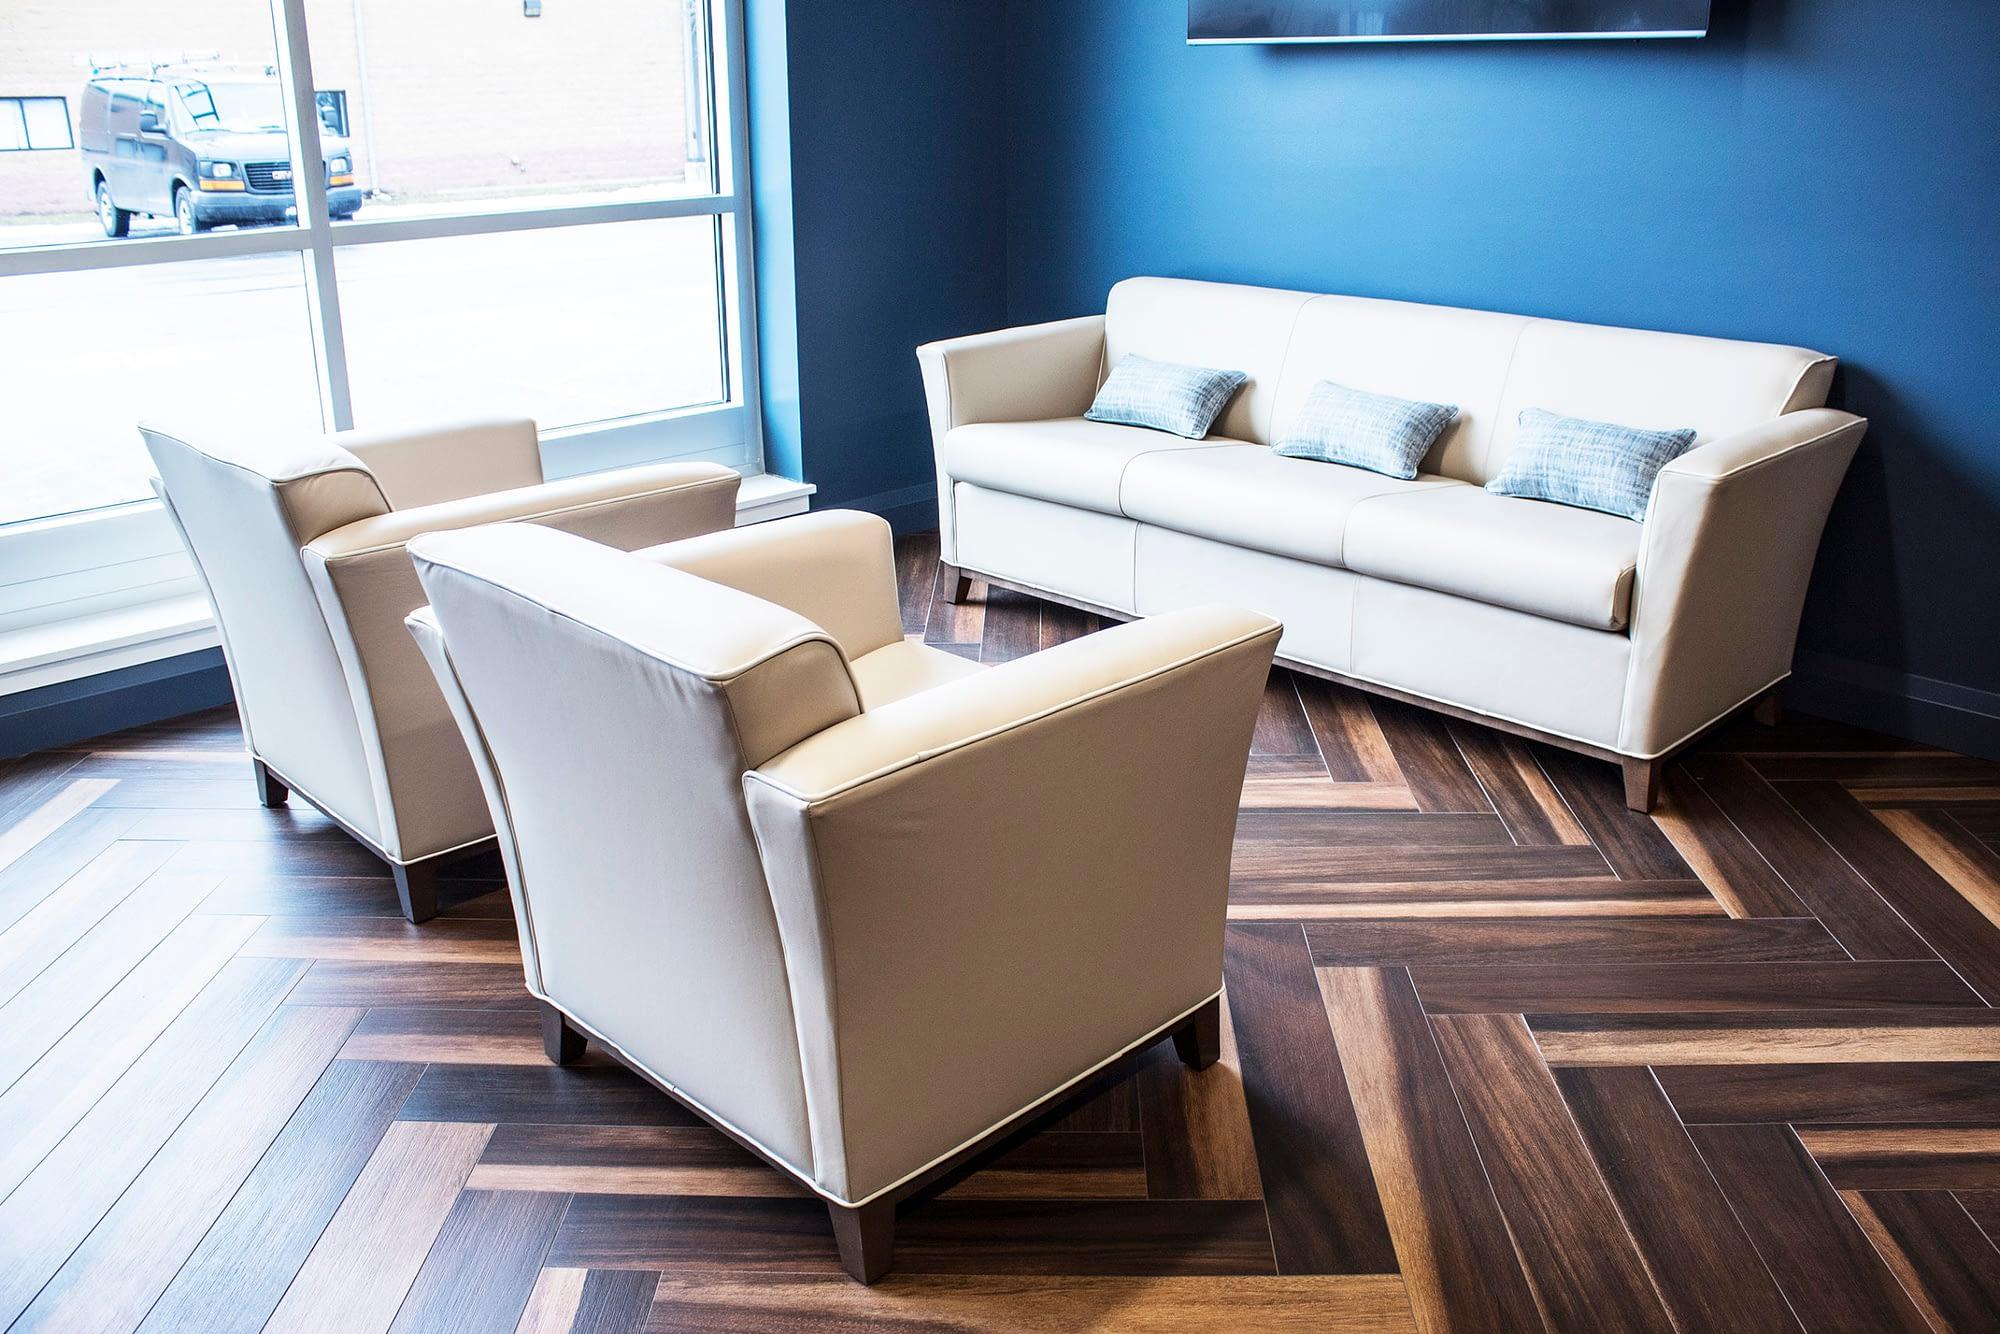 Tranksteck Executive Office Loung Seating - Copy